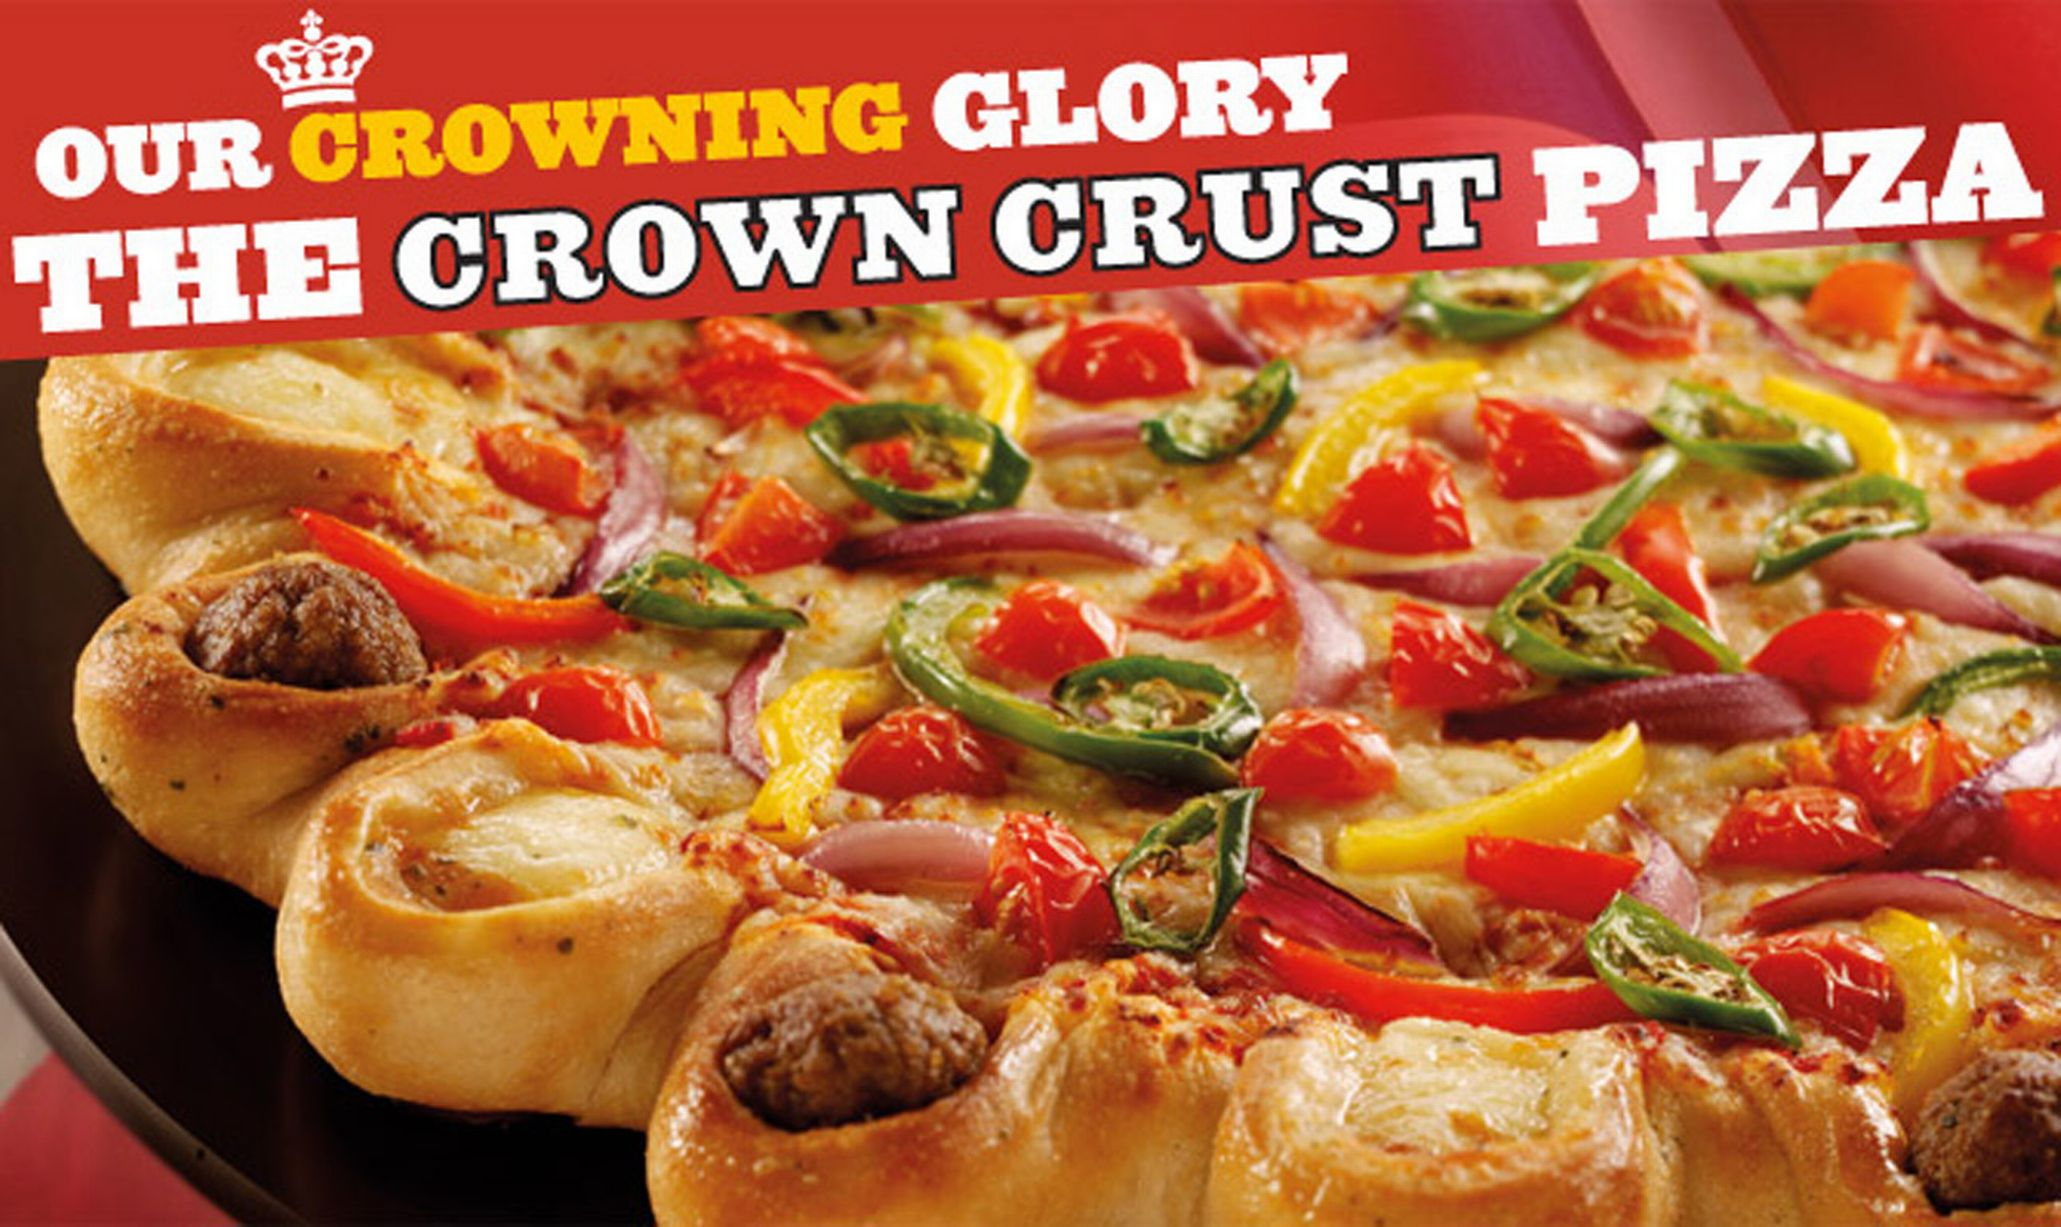 Crown_Crust_Pizza